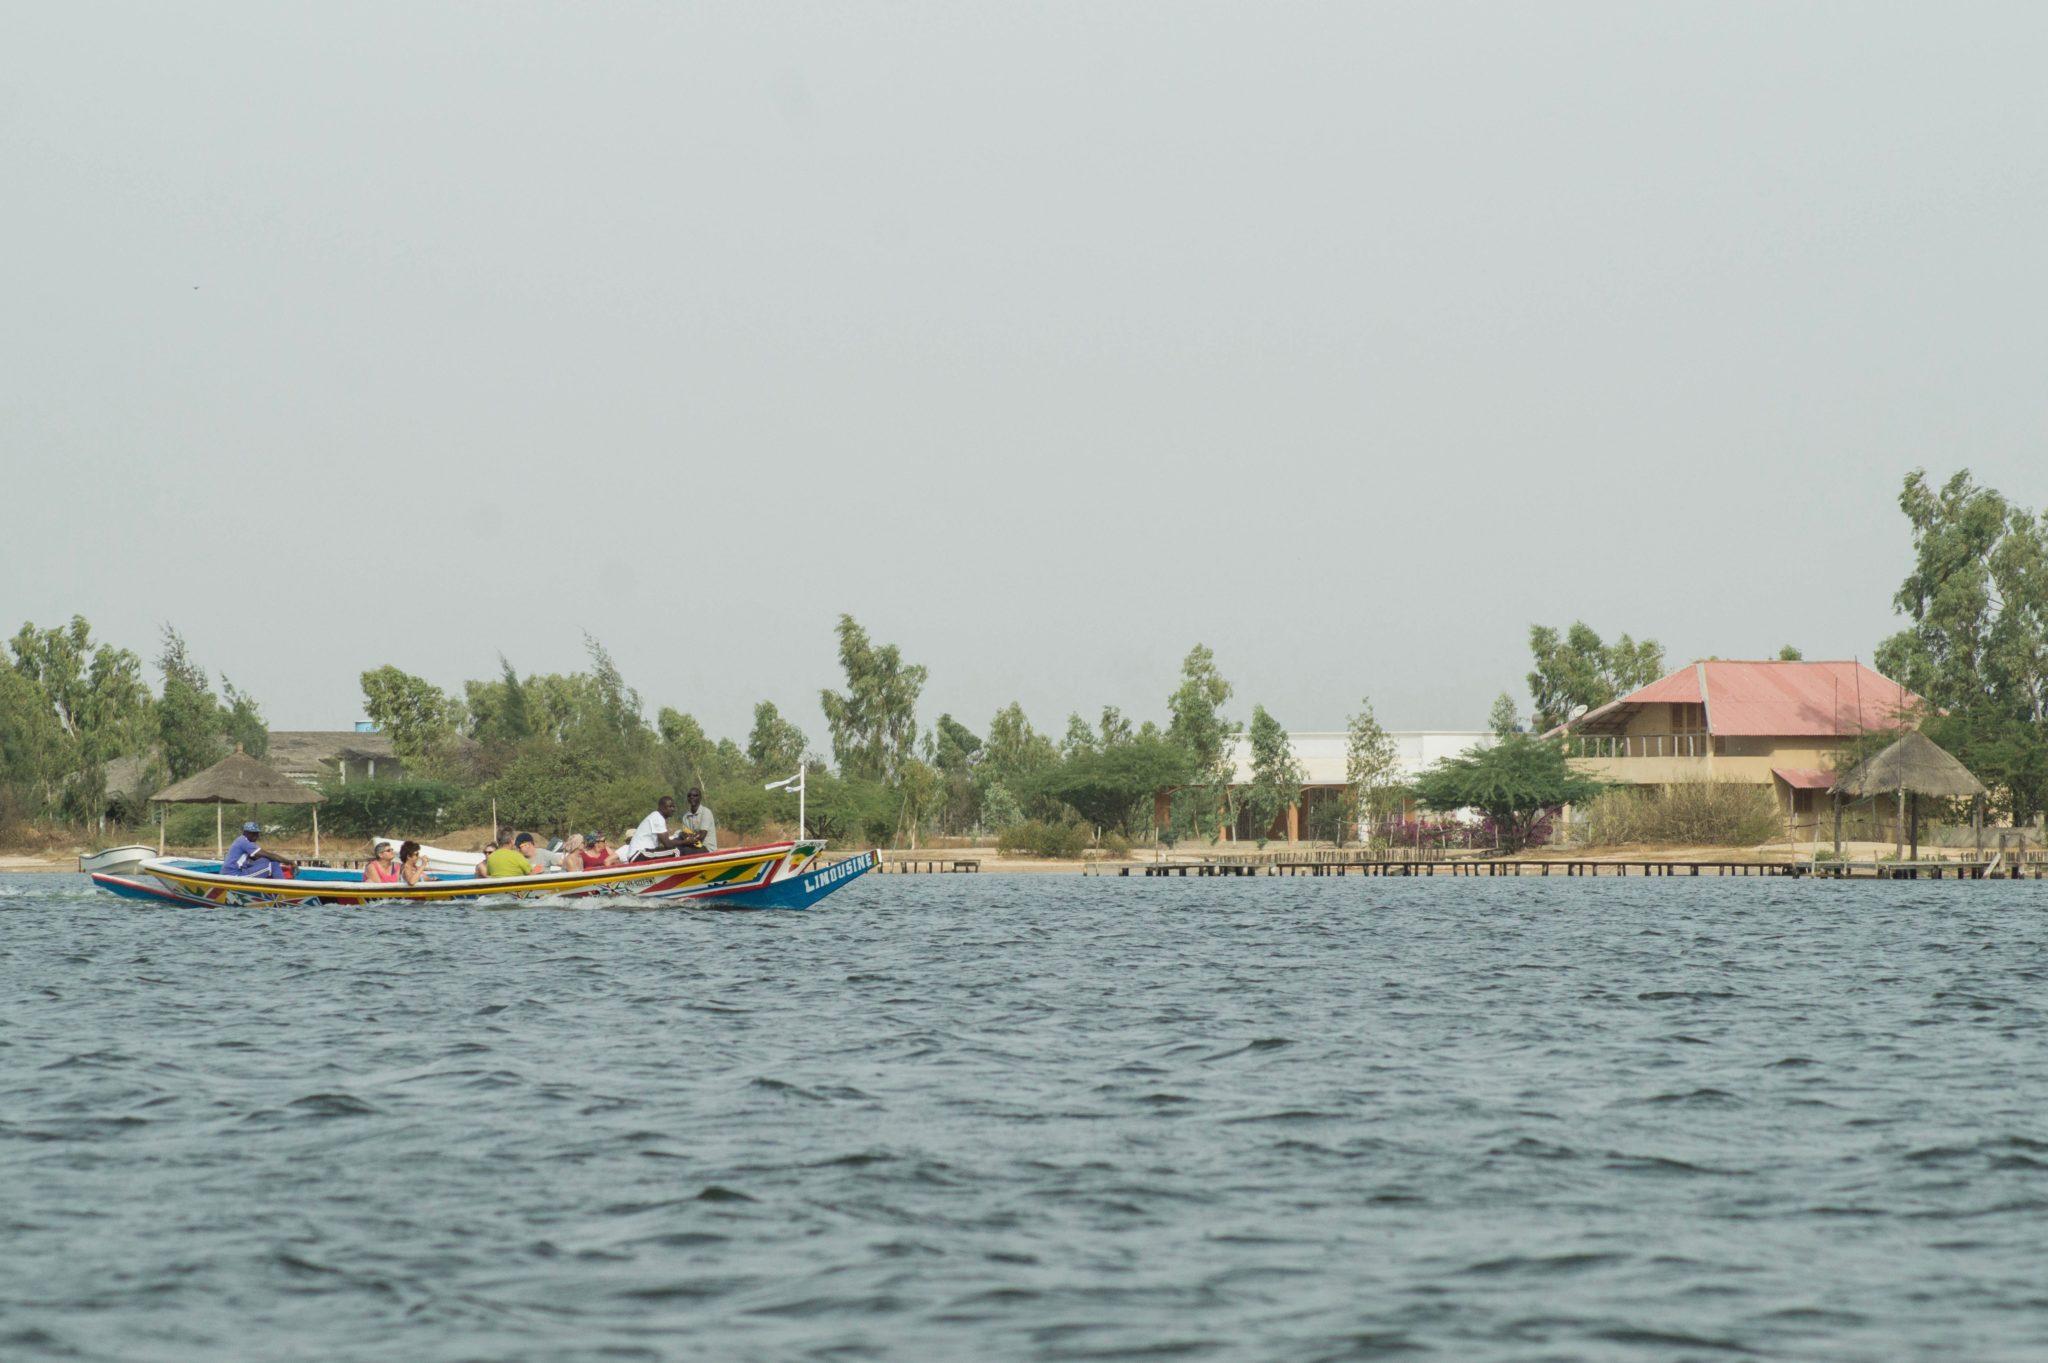 Touristen auf der Piroge in Richtung Le Bazouk du Saloum im Sine Saloum Senegal